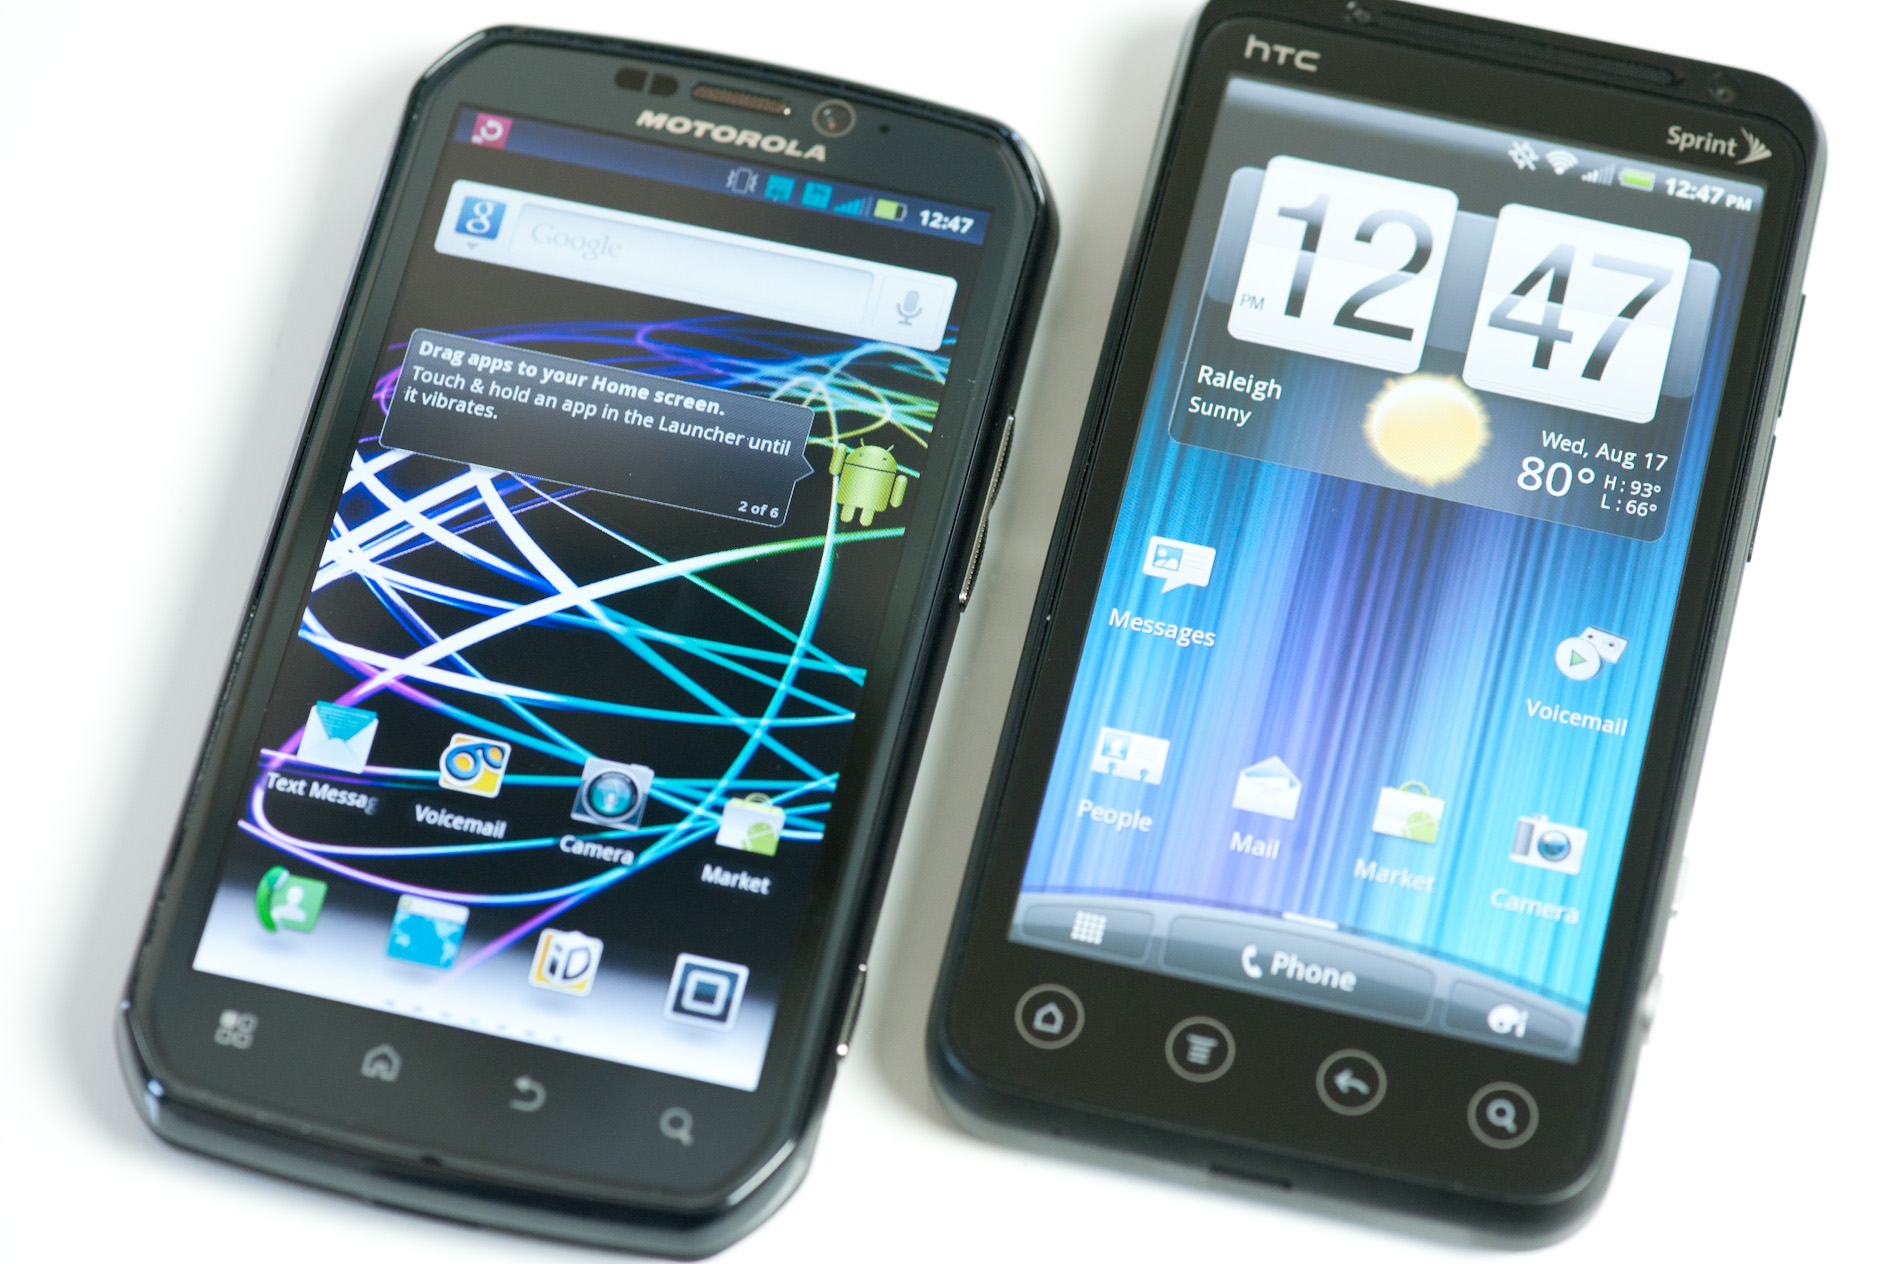 htc evo 3d vs motorola photon 4g choosing the best sprint phone rh anandtech com Motorola Photon Phone Motorola Photon Phone